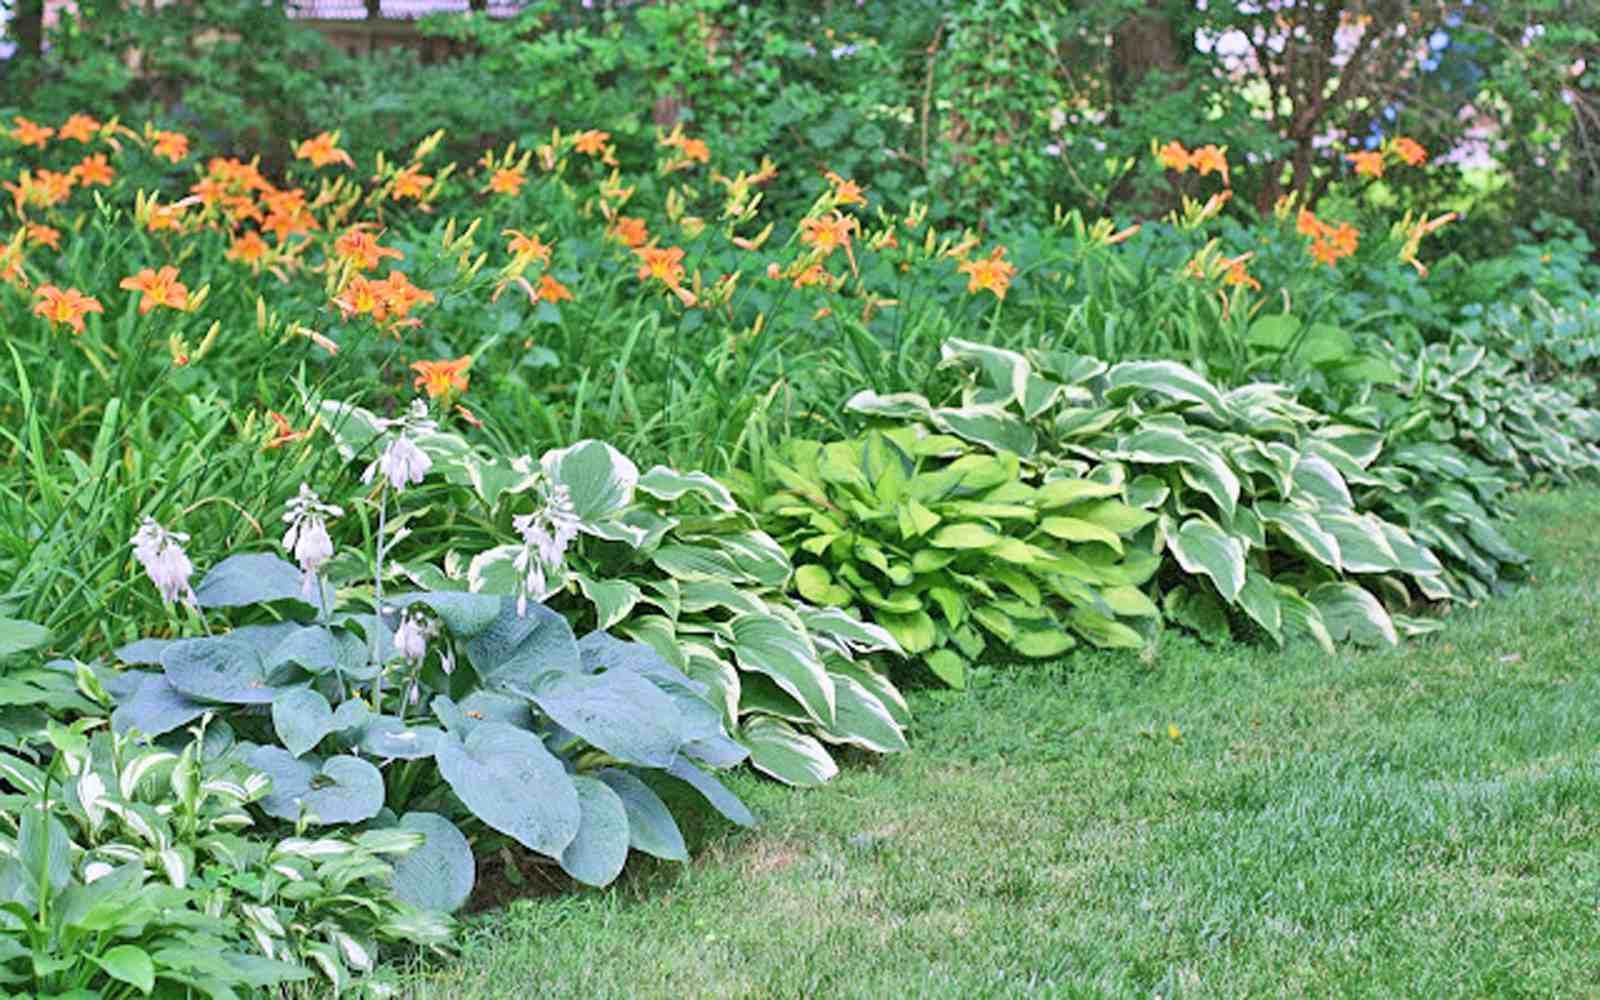 15 Garden Edging Ideas on and hosta flower bed, hosta garden ideas around large tree, hosta garden design,